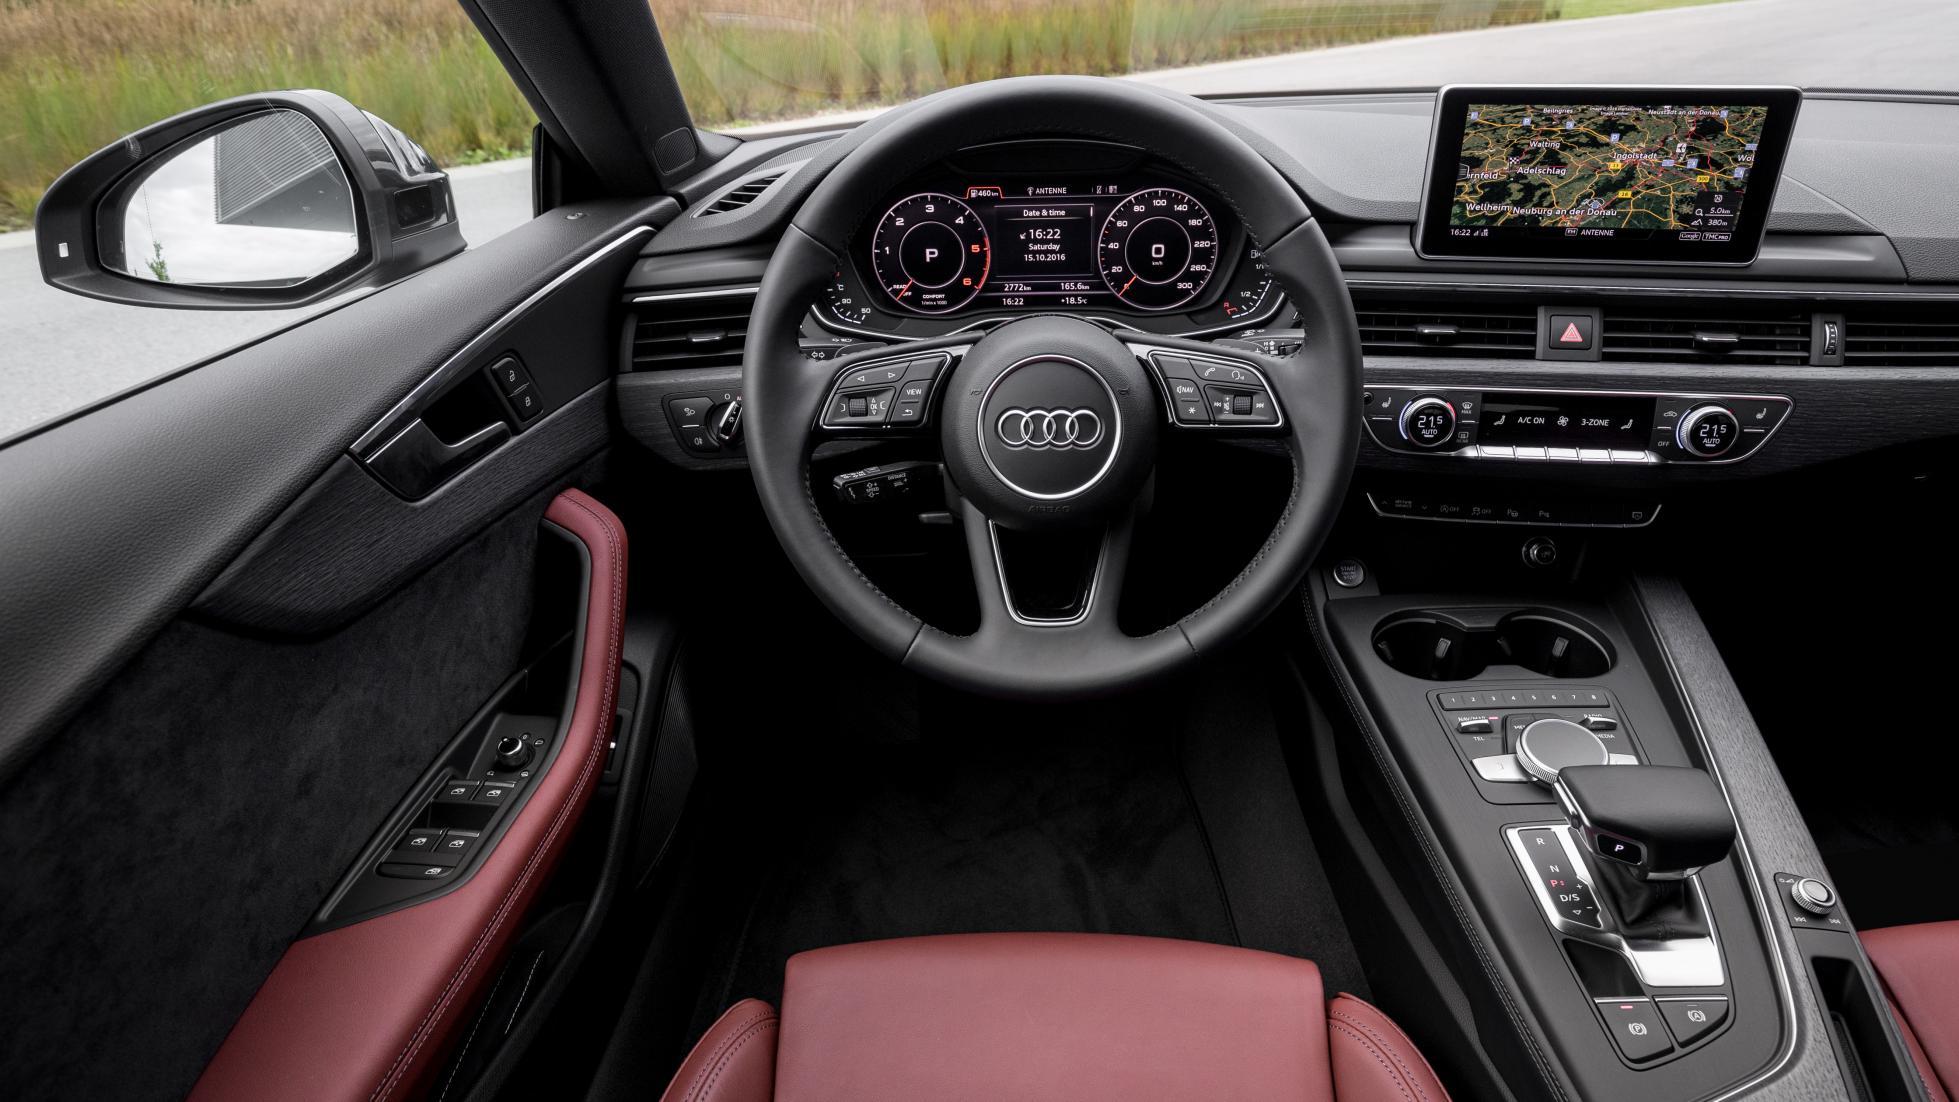 Audi A5 Sportback interior driver's seat